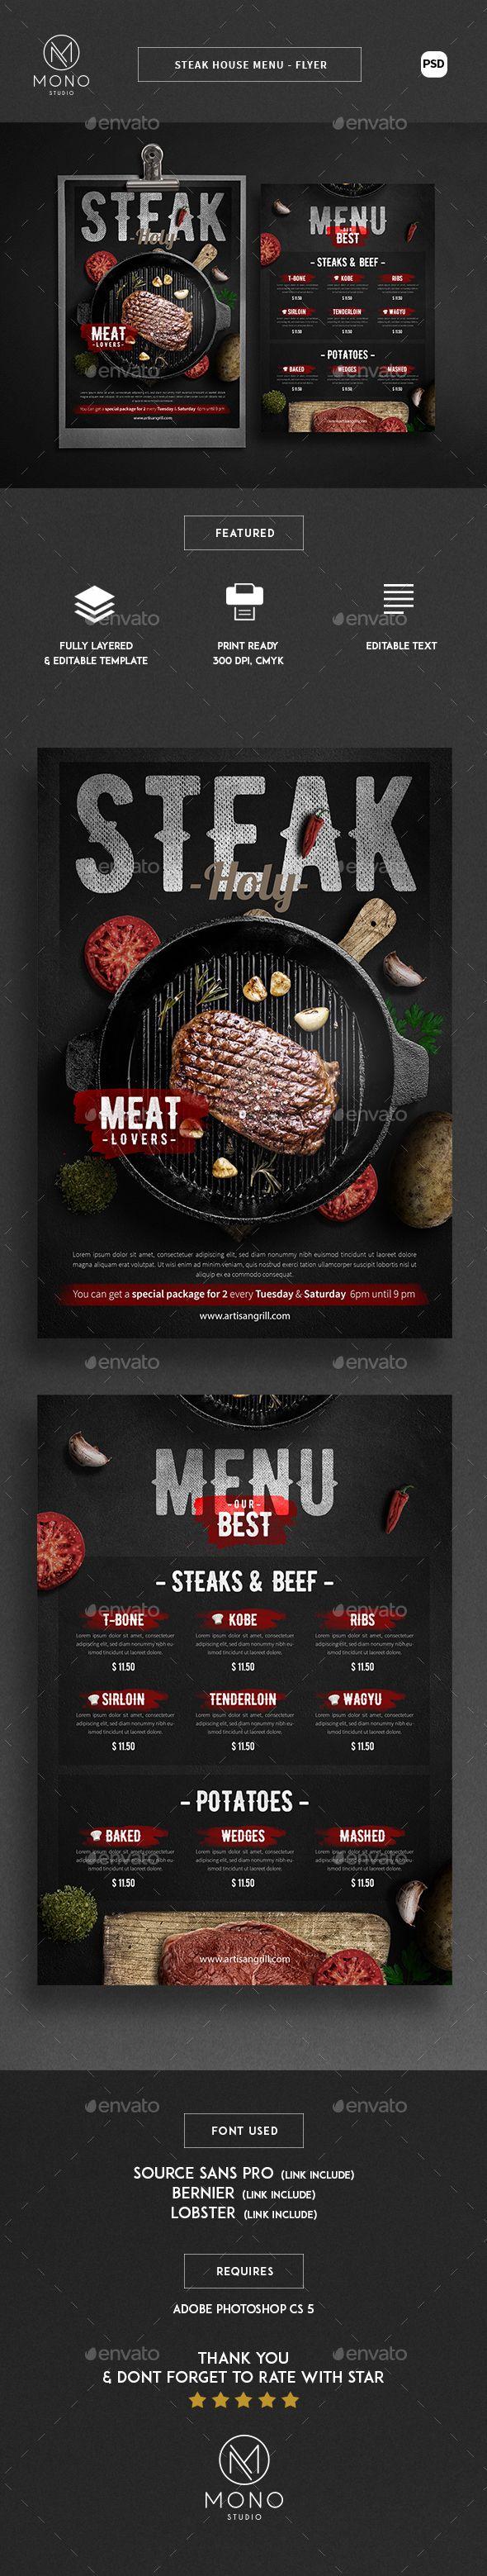 48 best Food Flyer Templates images on Pinterest | Flyer template ...